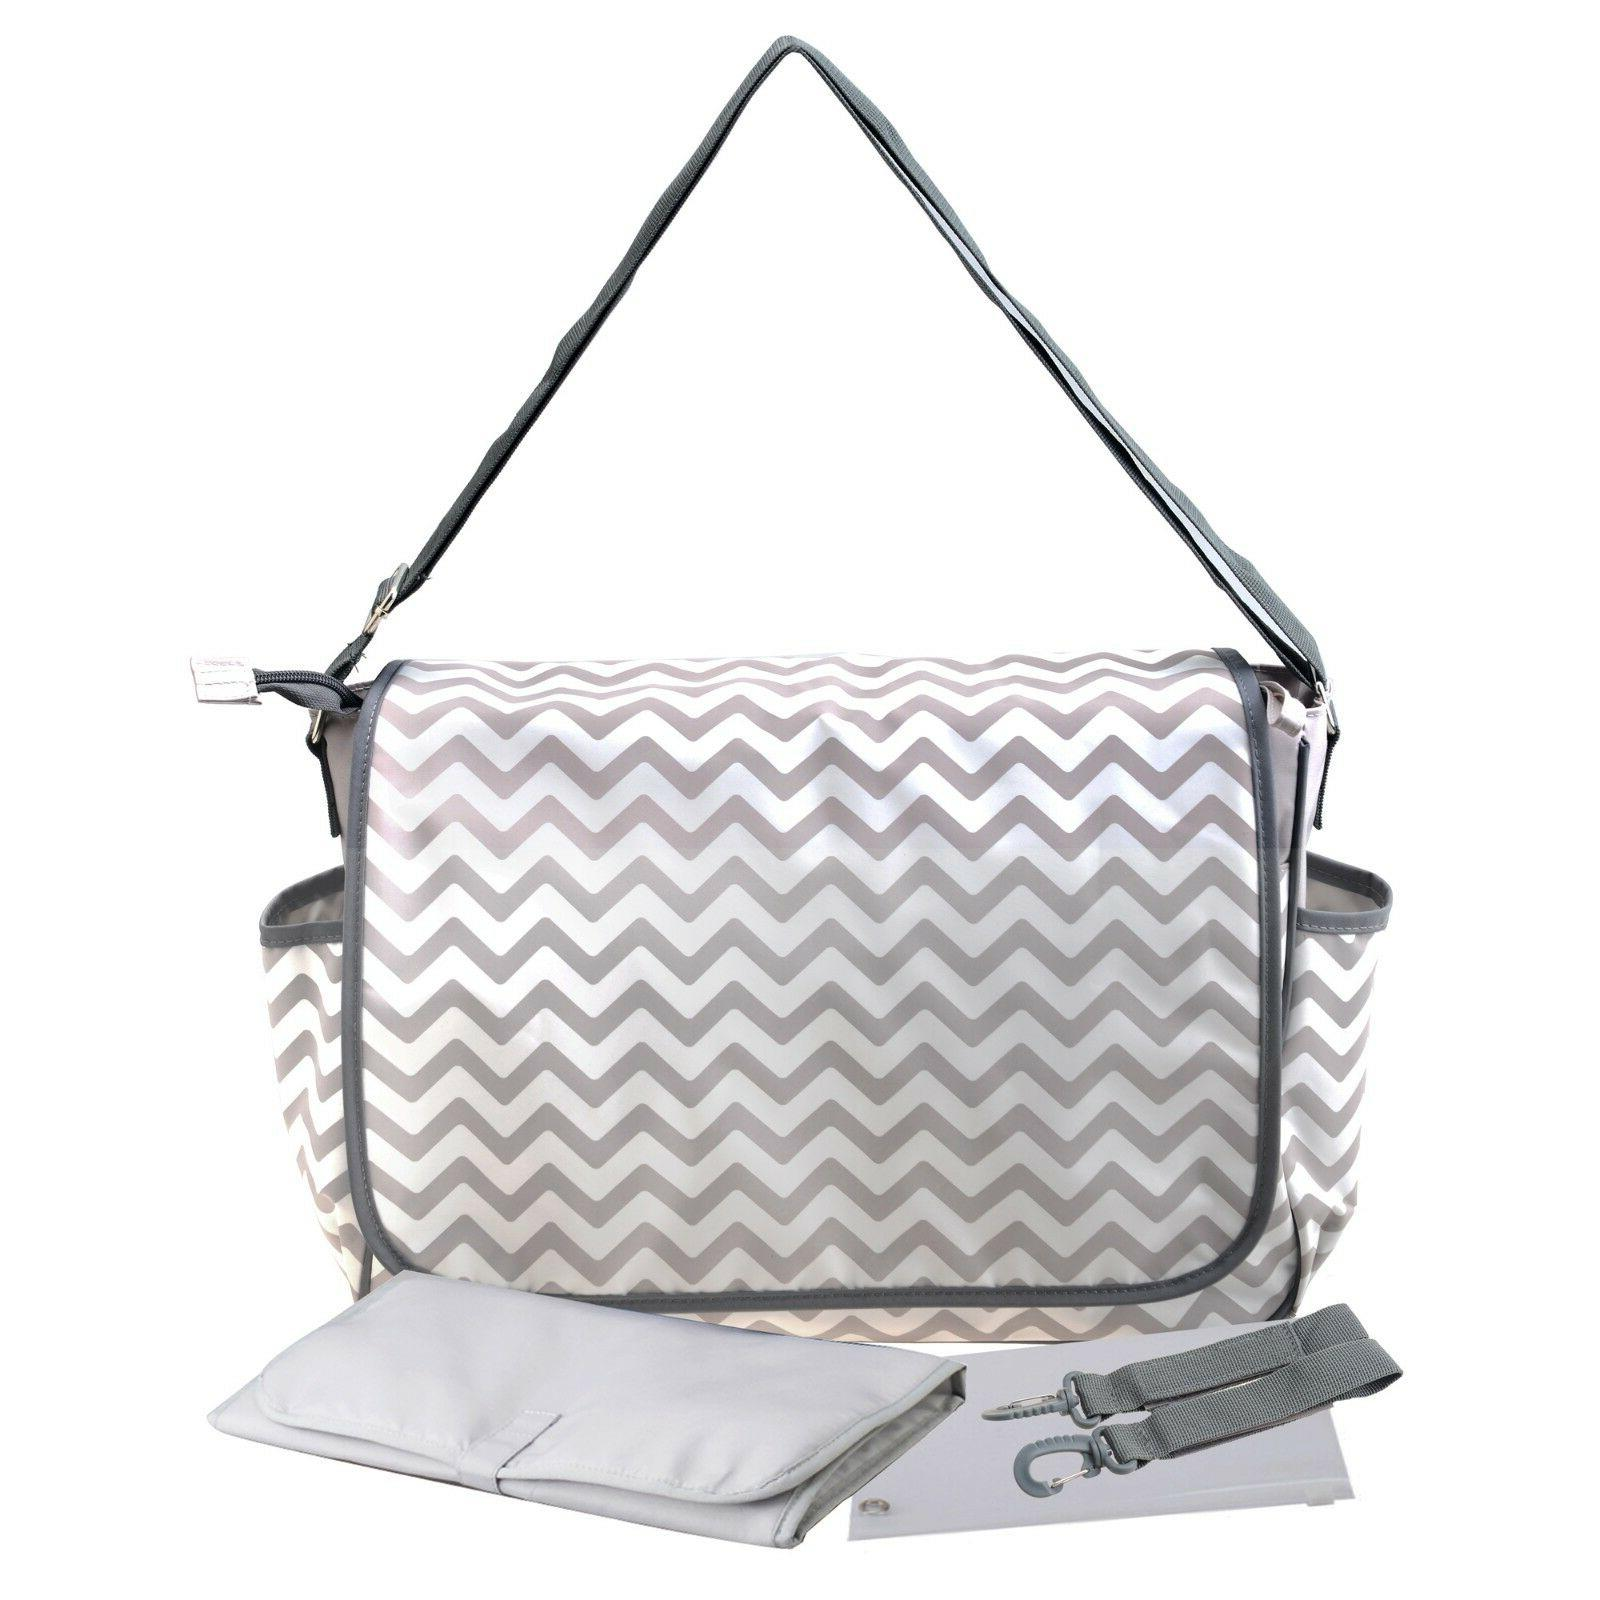 diaper tote bags multi function waterproof travel